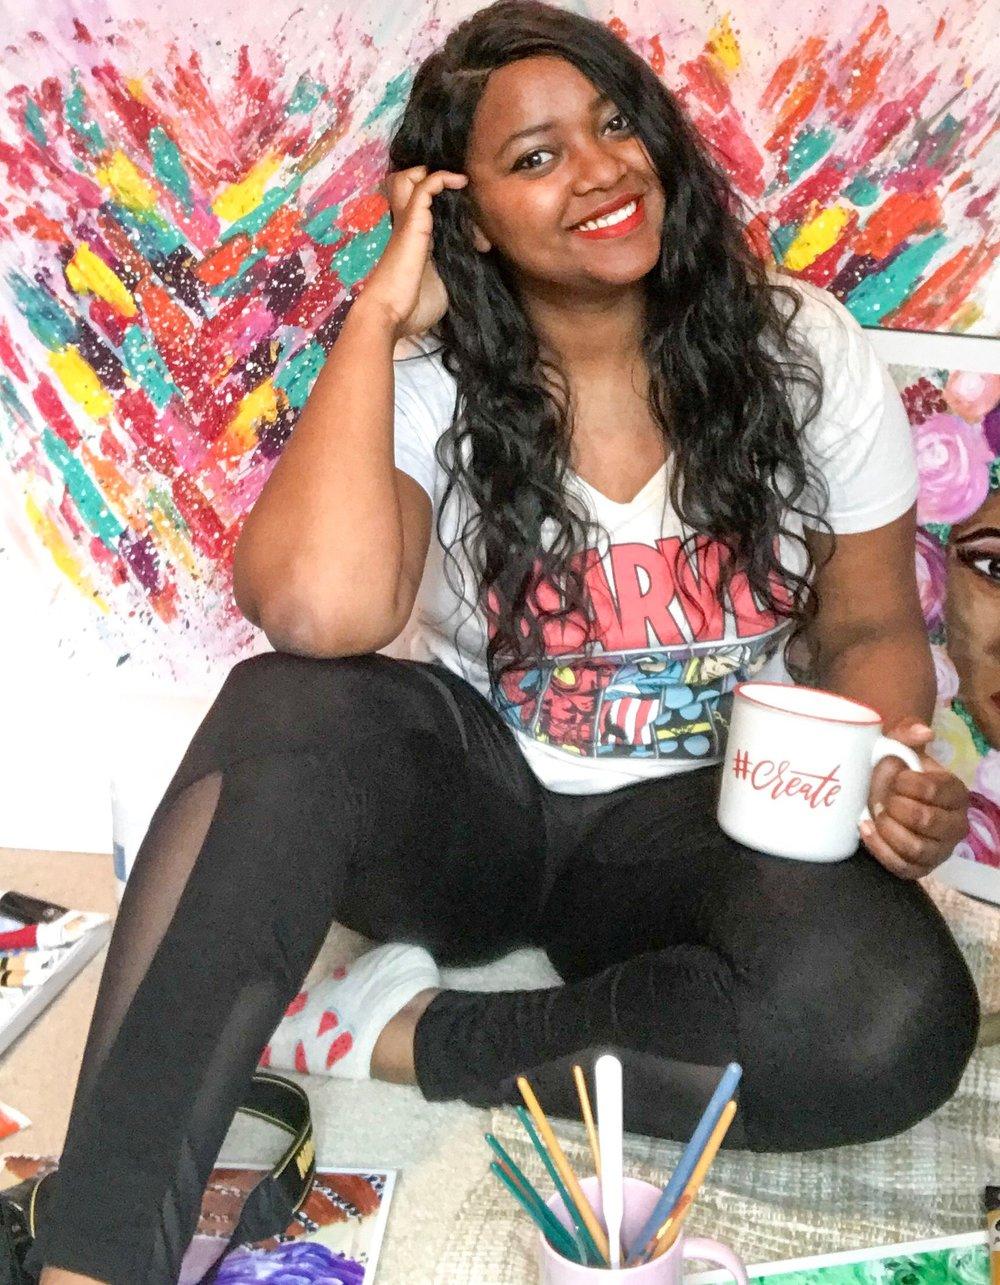 6 Things I Learned As A Creative Entrepreneur - Sillie Mugo